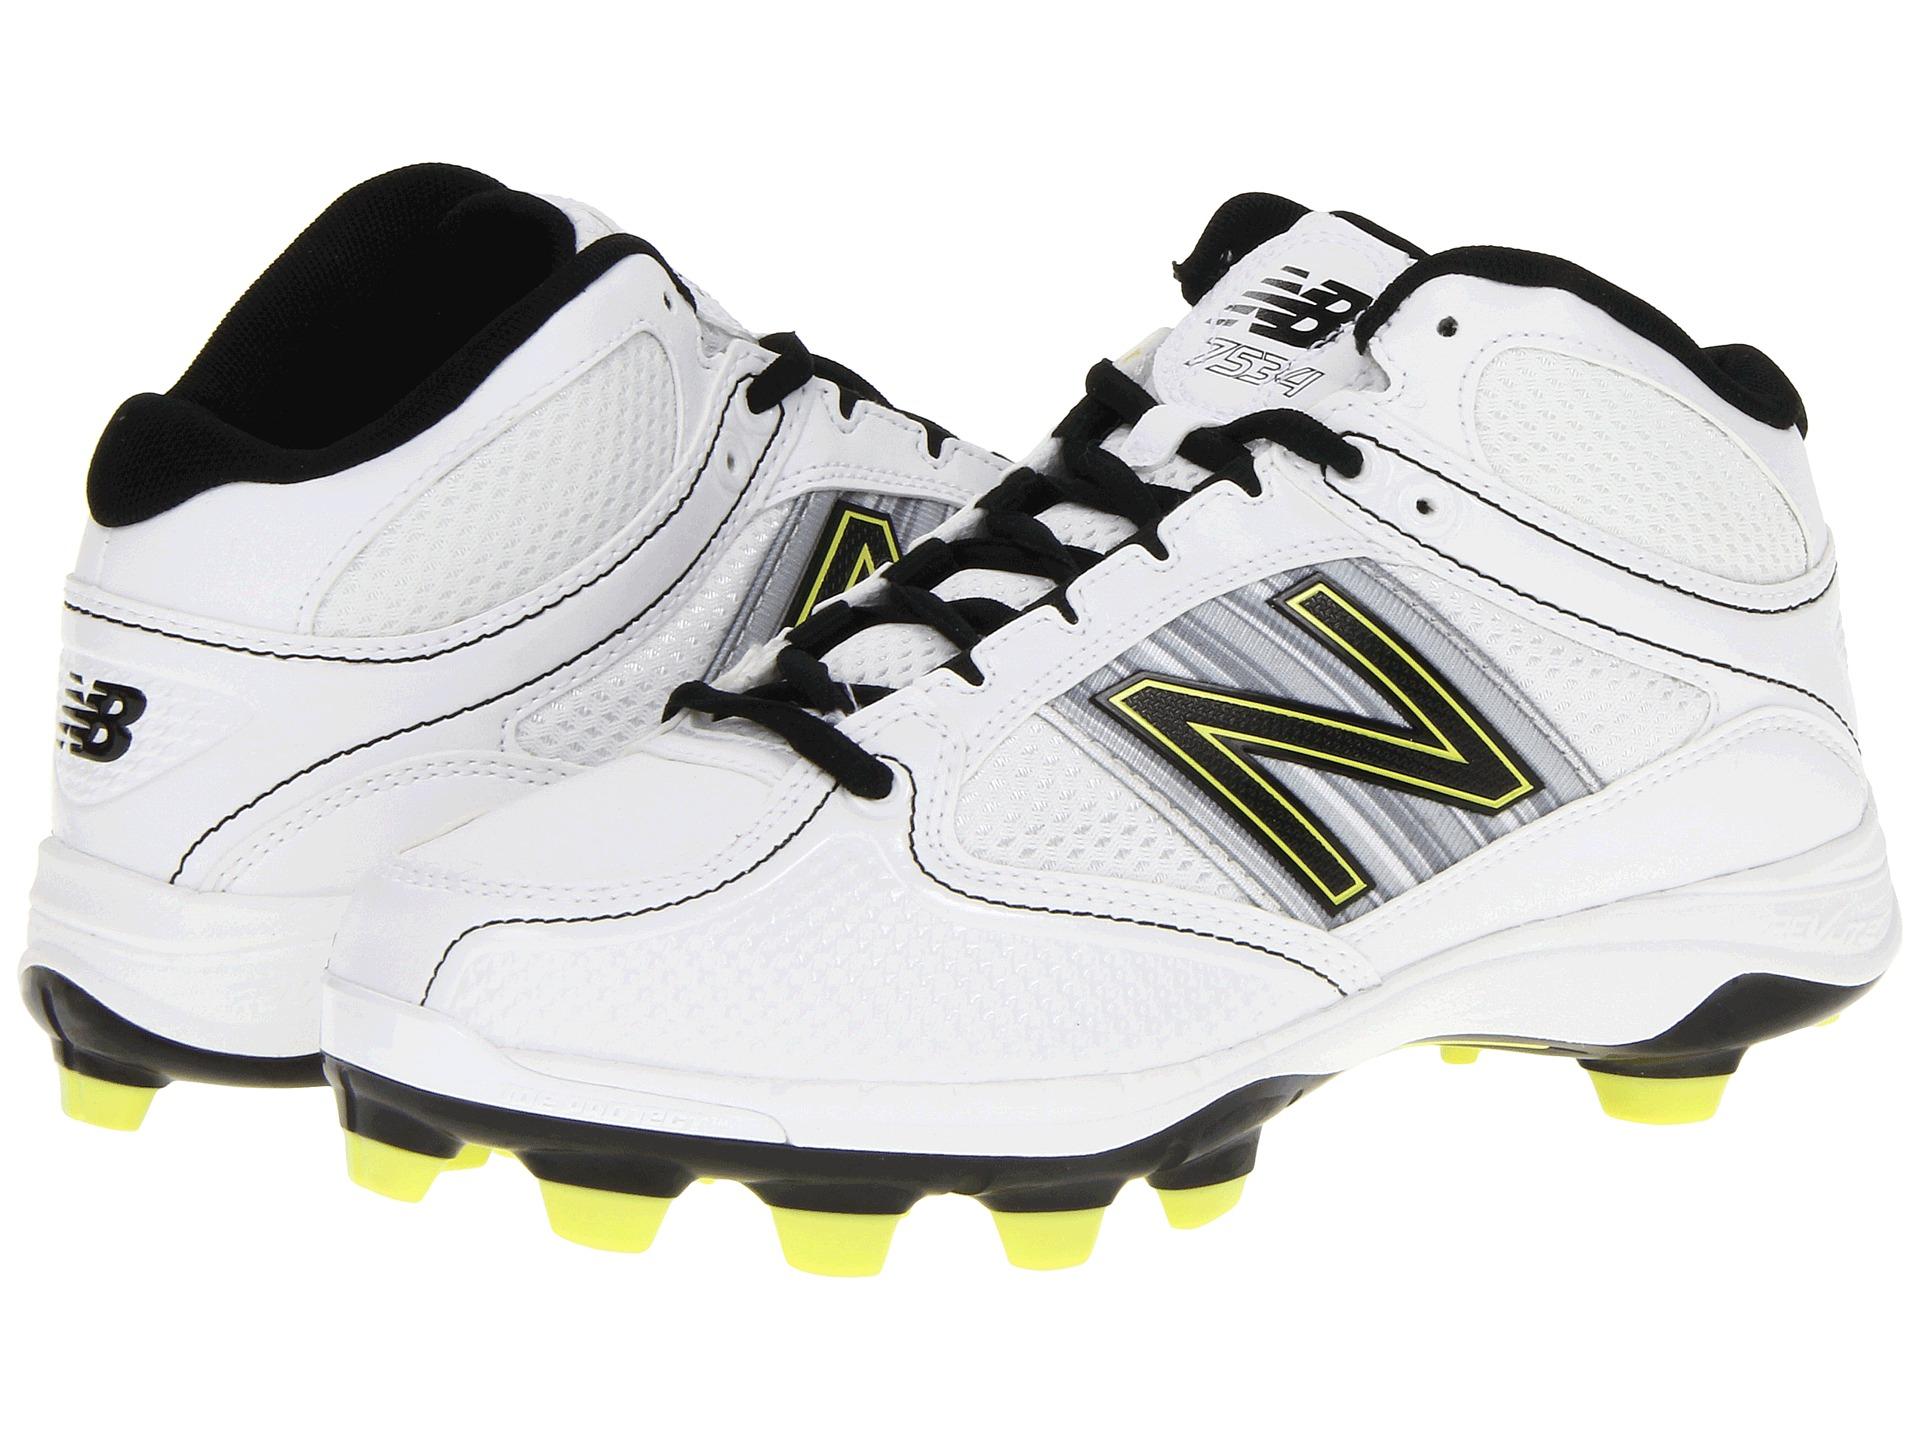 Womens Shoes New Balance WF7534 TPU Molded Mid-Cut White/Black